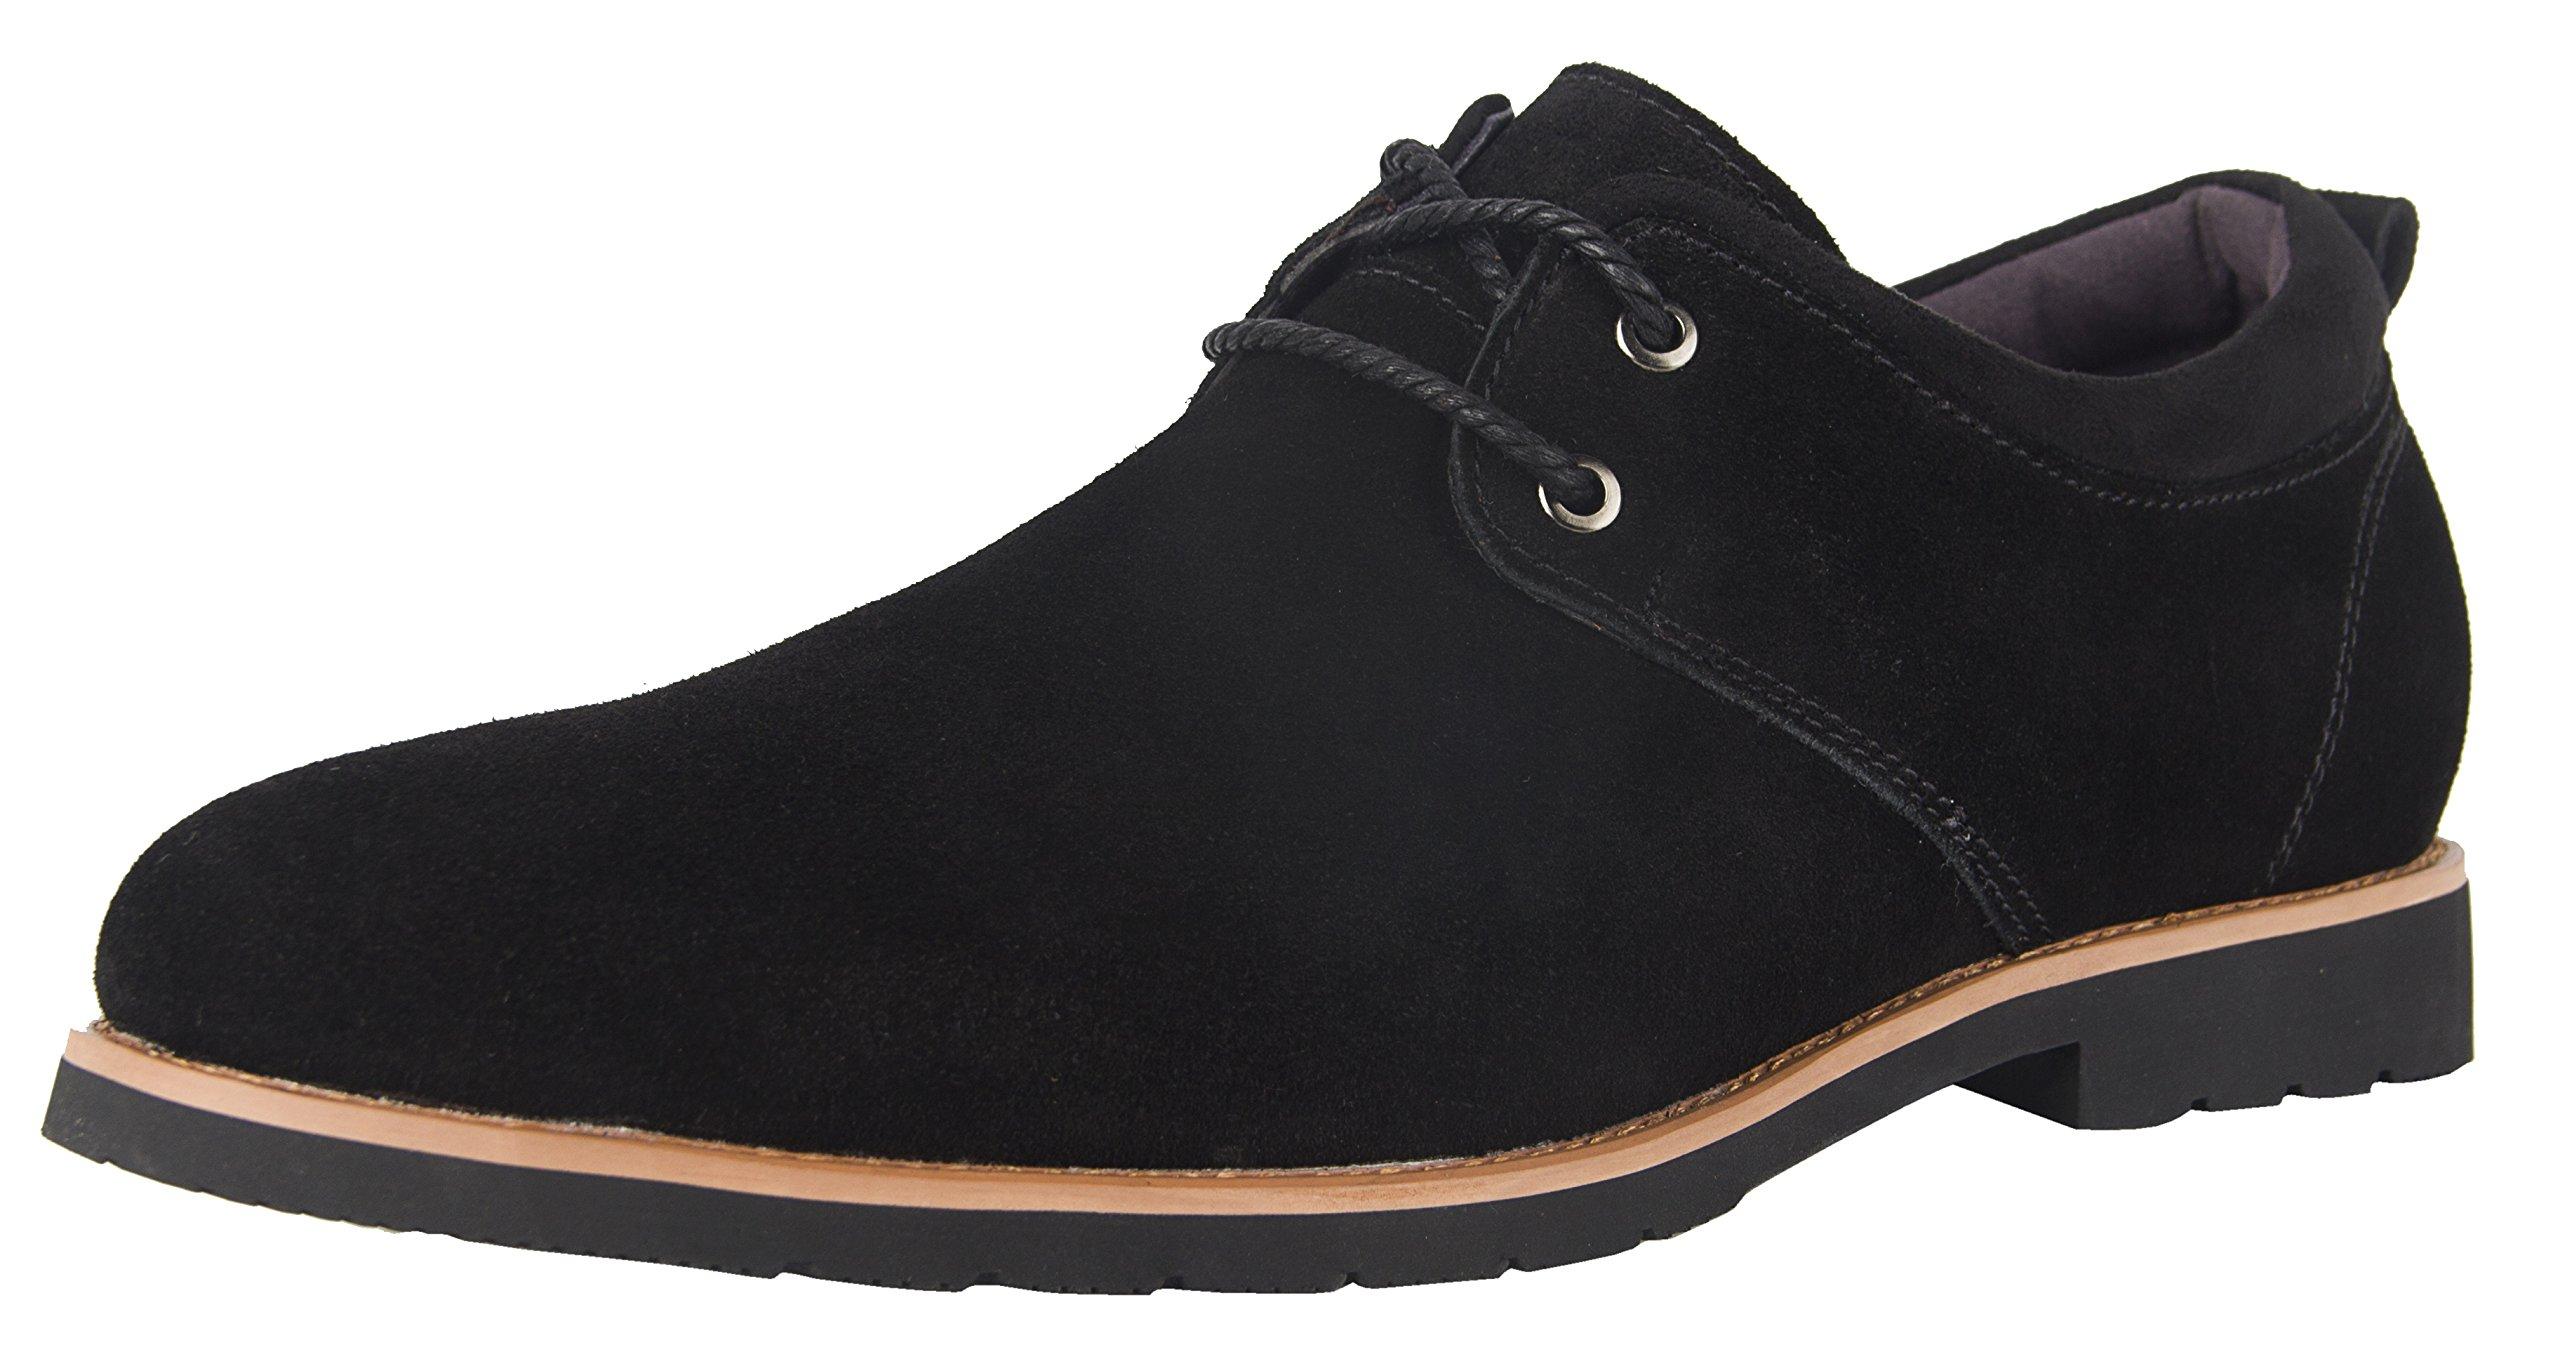 iLoveSIA Men's Classic Dress Oxford Suede Leather Formal Shoe Black US Size 9 by iLoveSIA